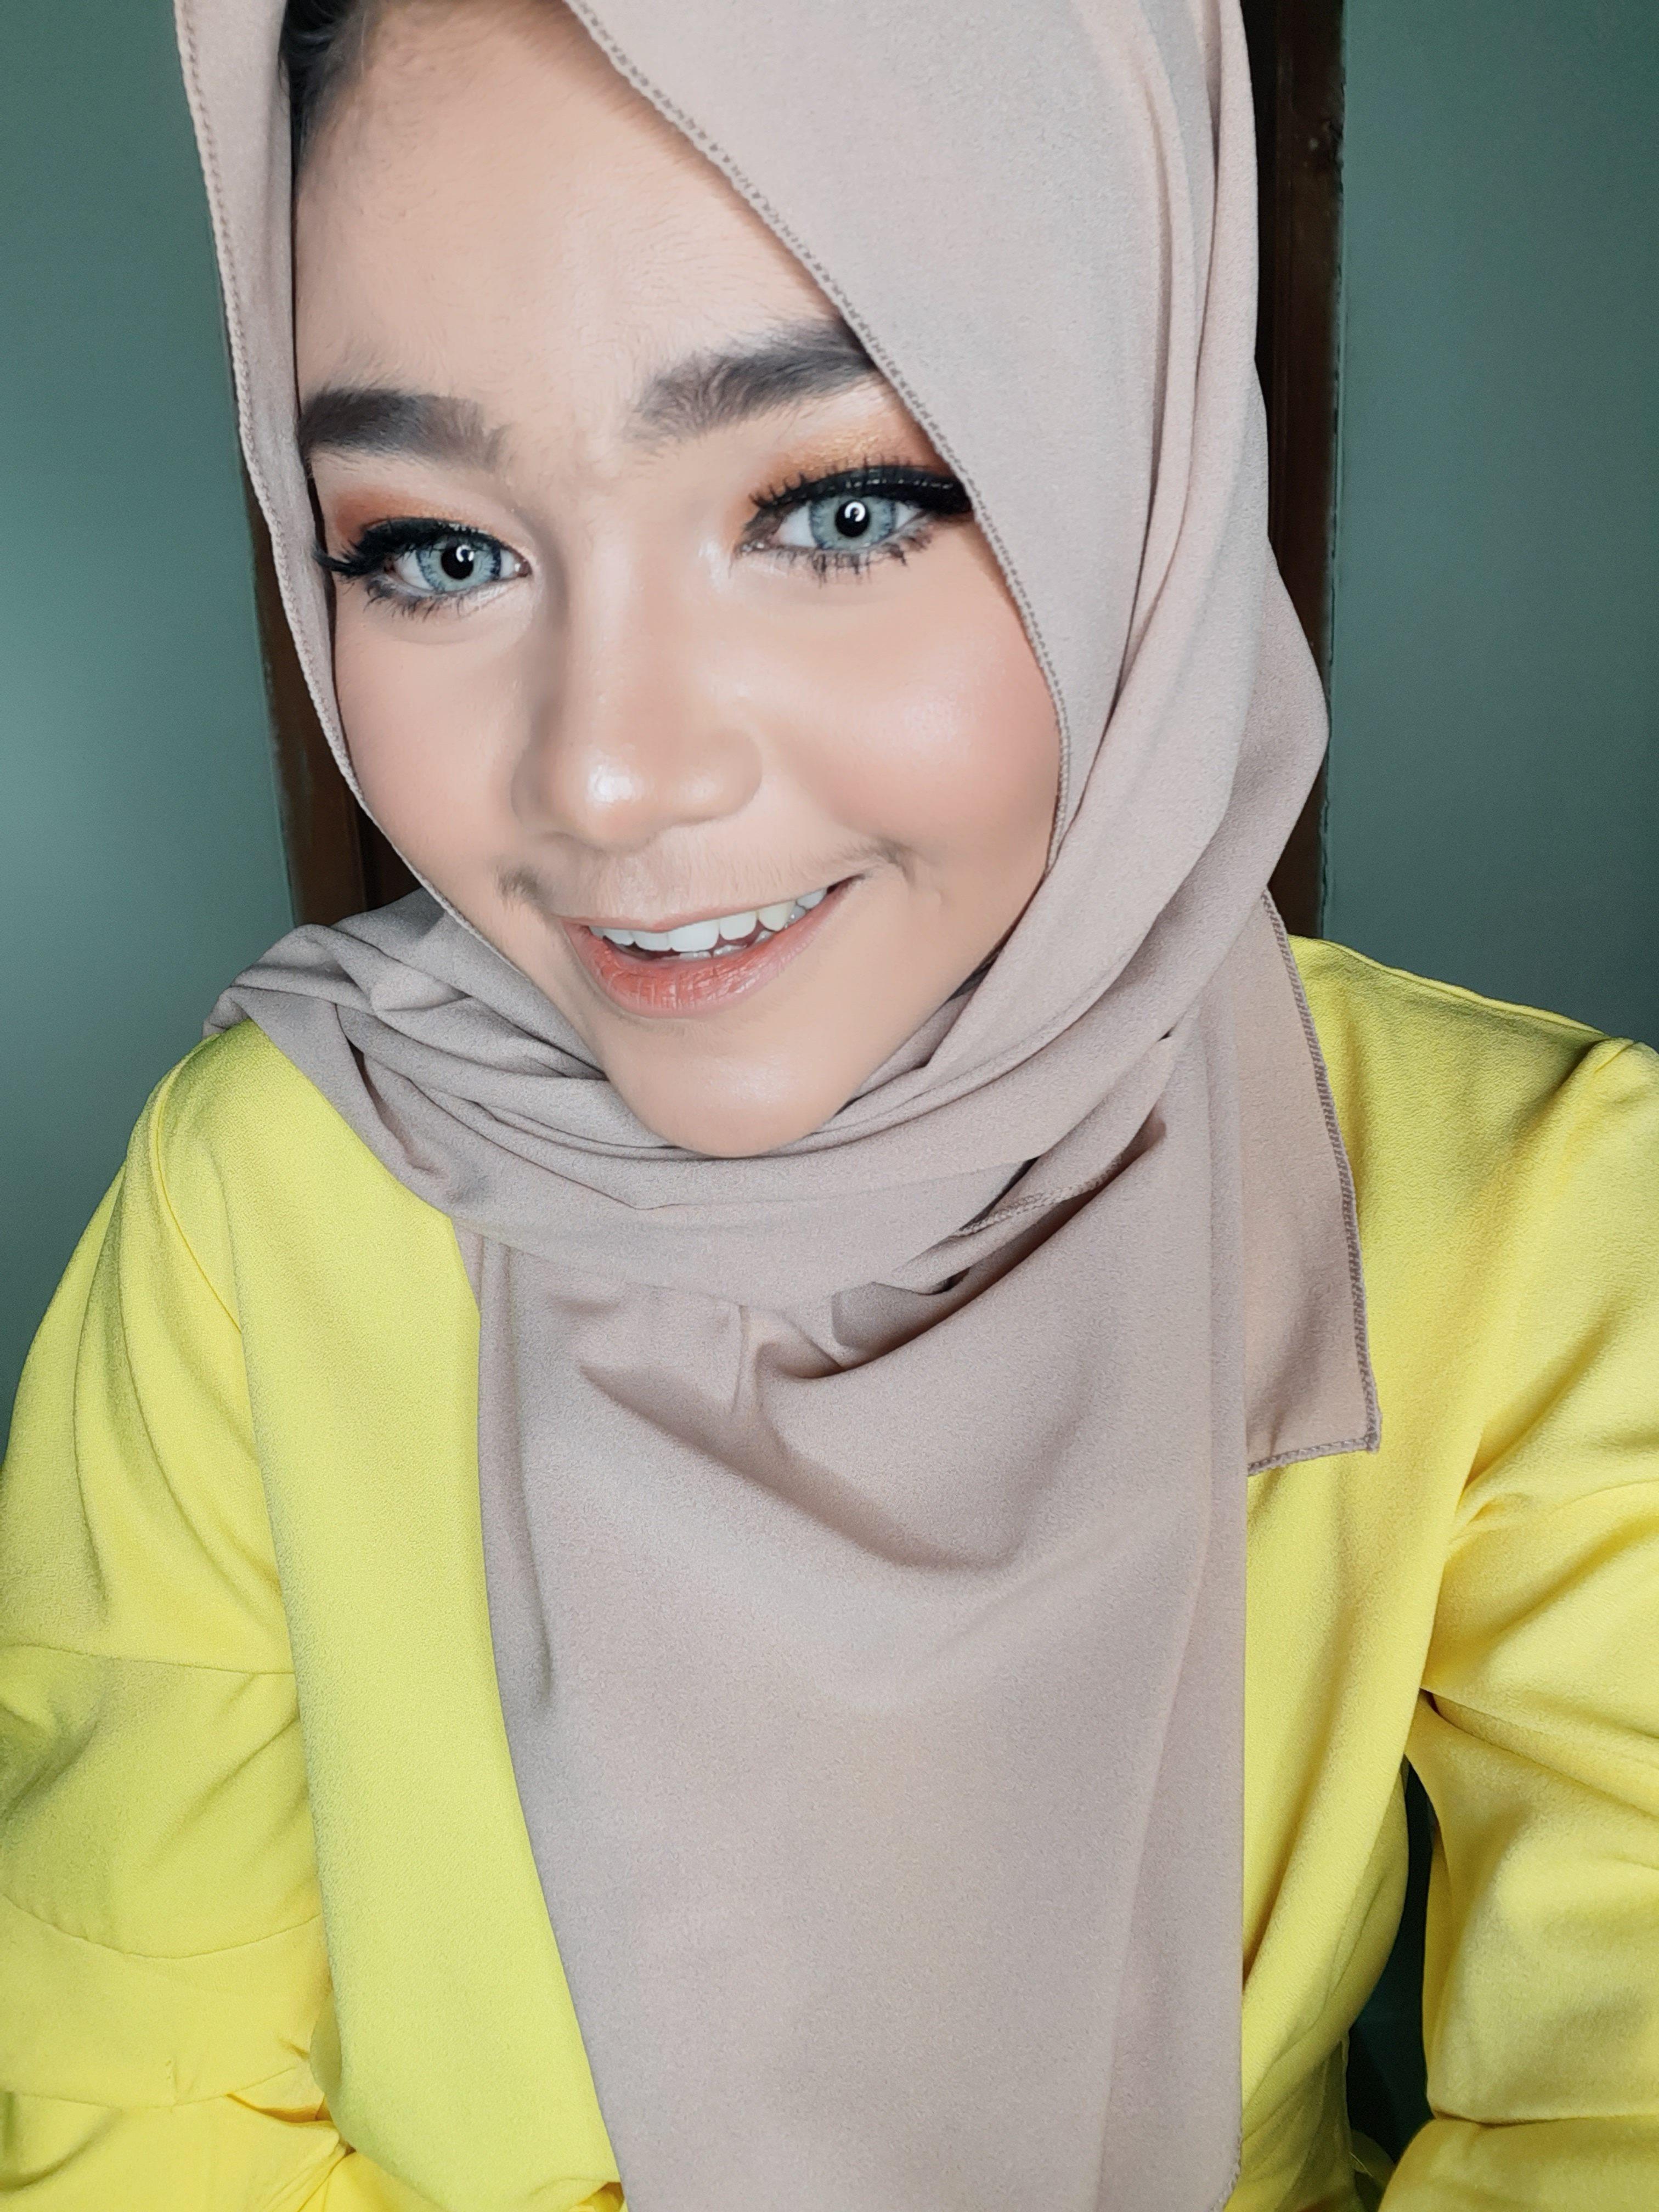 Penulis : Agmi Restyadiana Mahasiswi Universitas Muhammadiyah Sidoarjo, Prodi Ilmu Komunikasi.